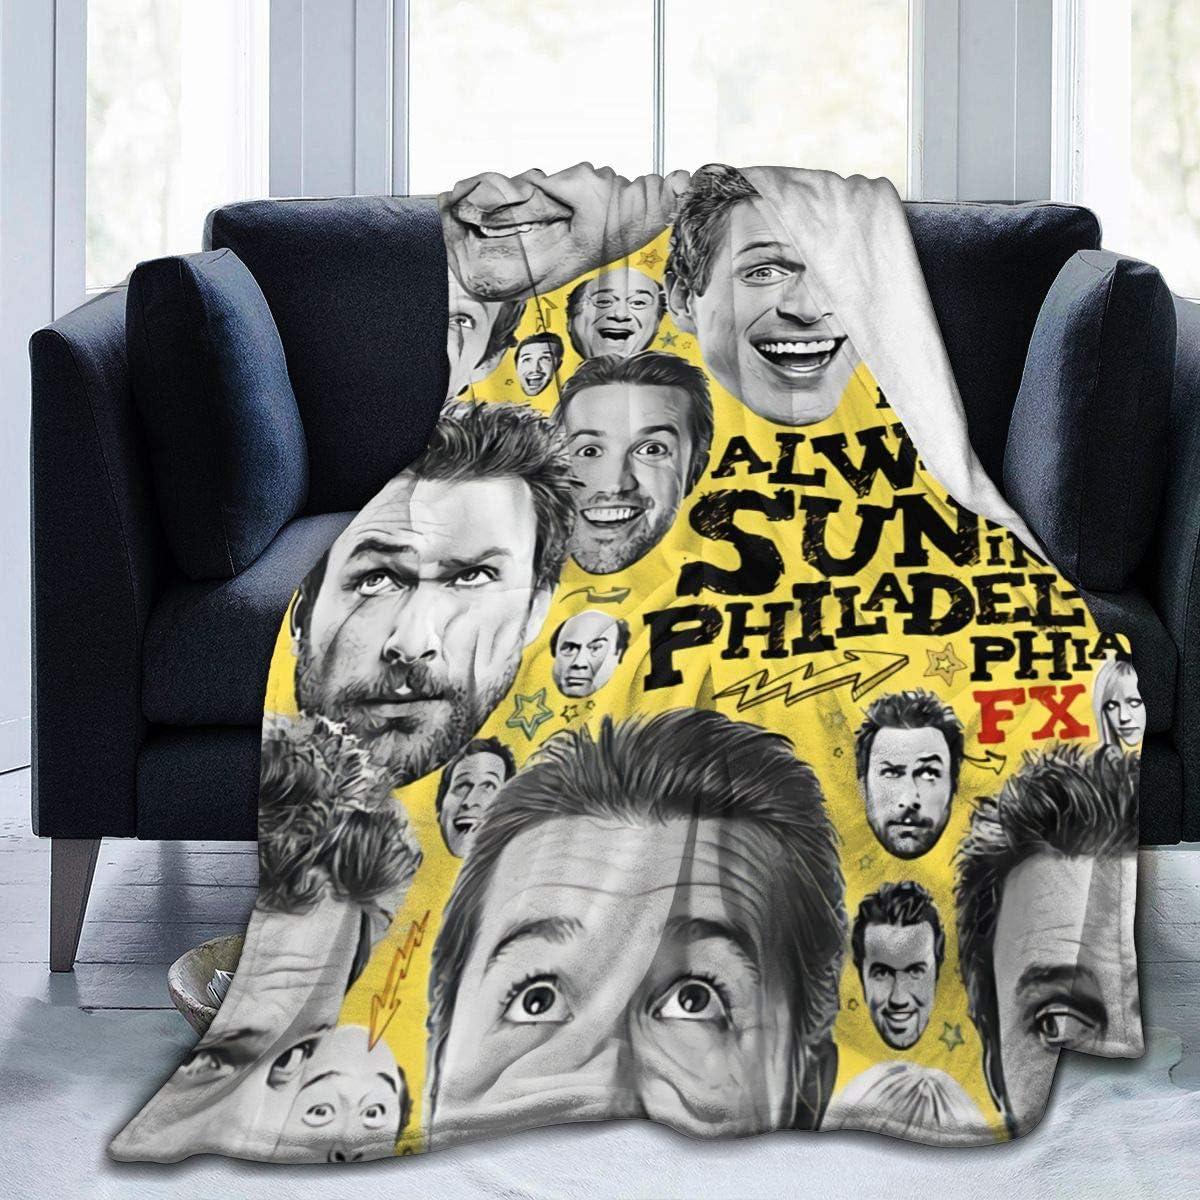 Ddsss It's-Always-Sunny-in-Philadelphia-Season Luxury Flannel Blanket Queen Size Velvet Plush Throw Microfiber Blanket All Season 60x50 Inch